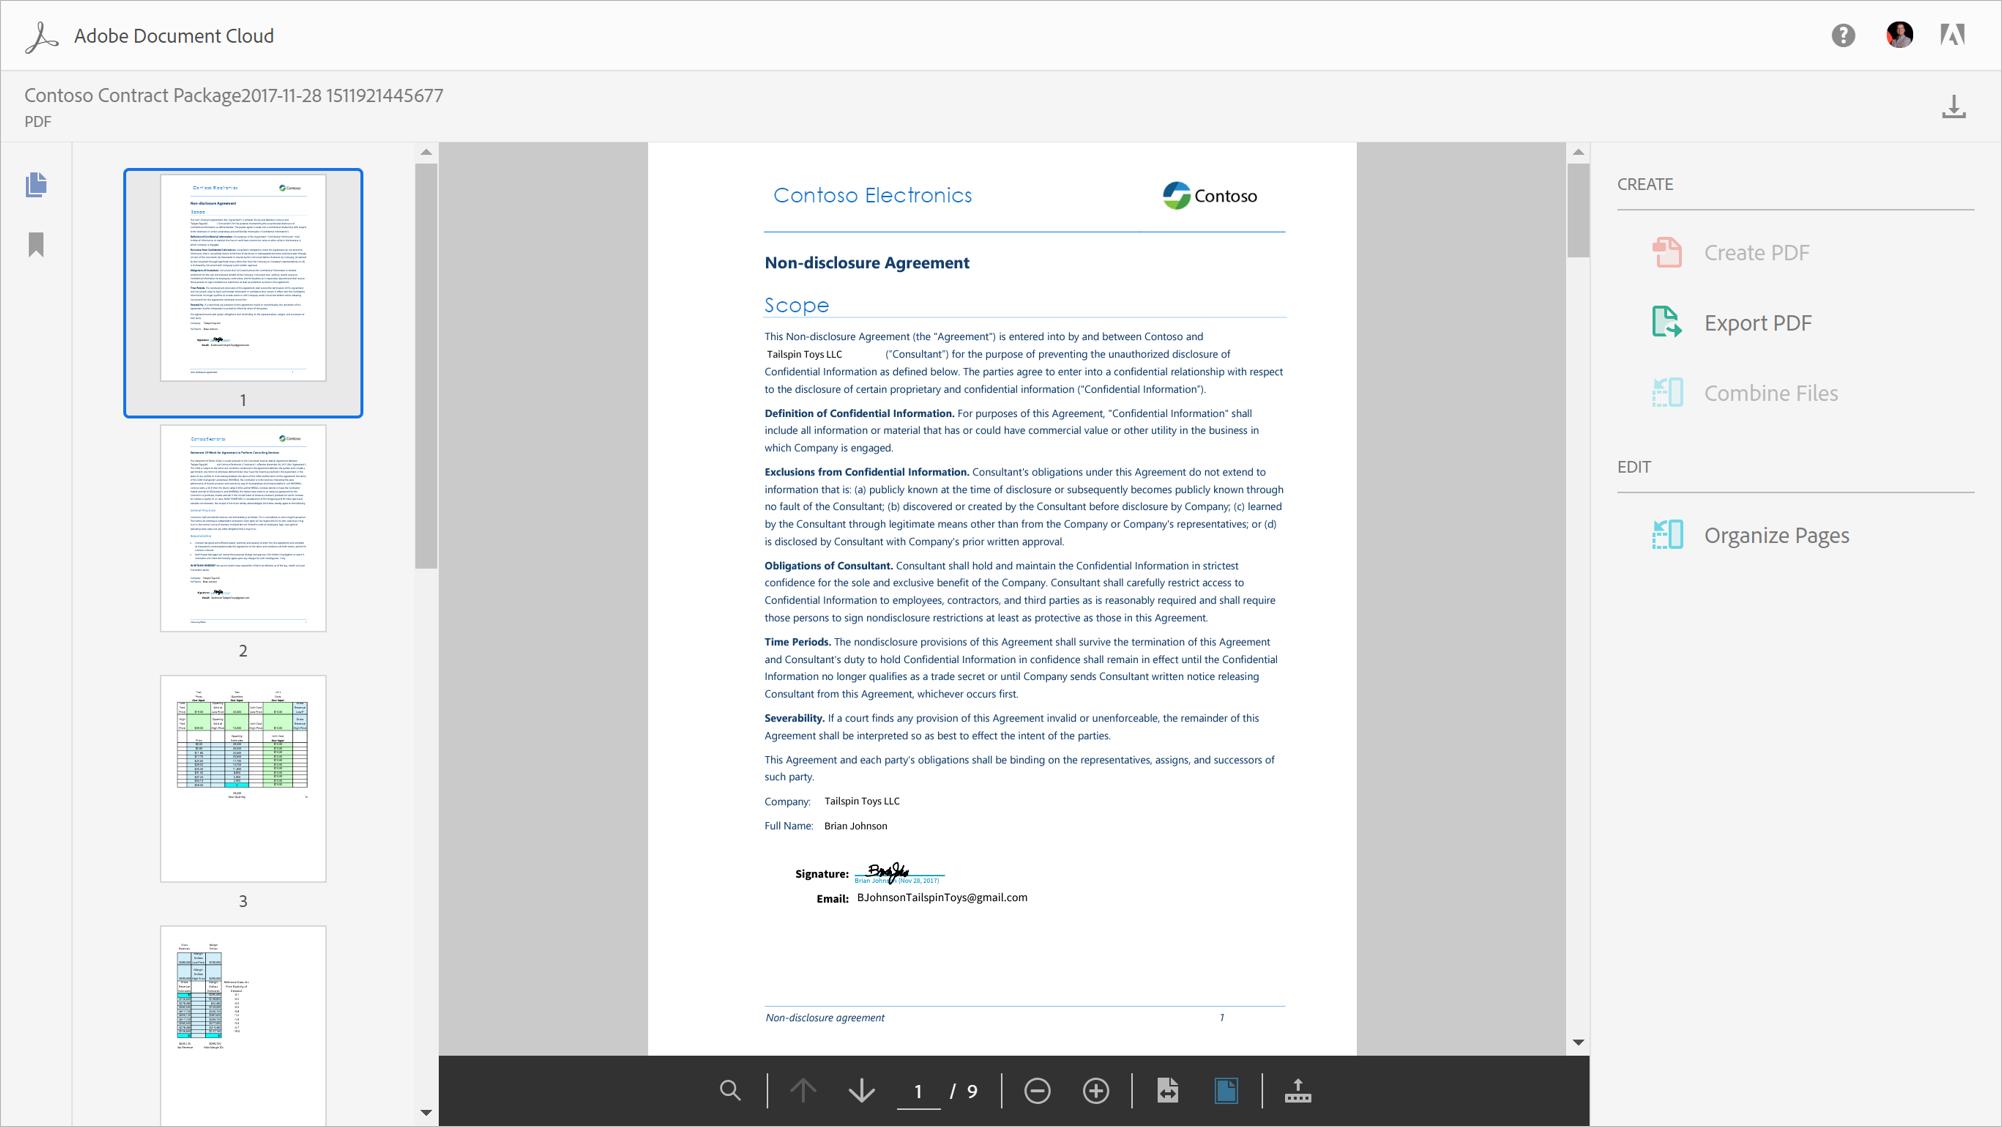 Adobe Document Cloud Office 365